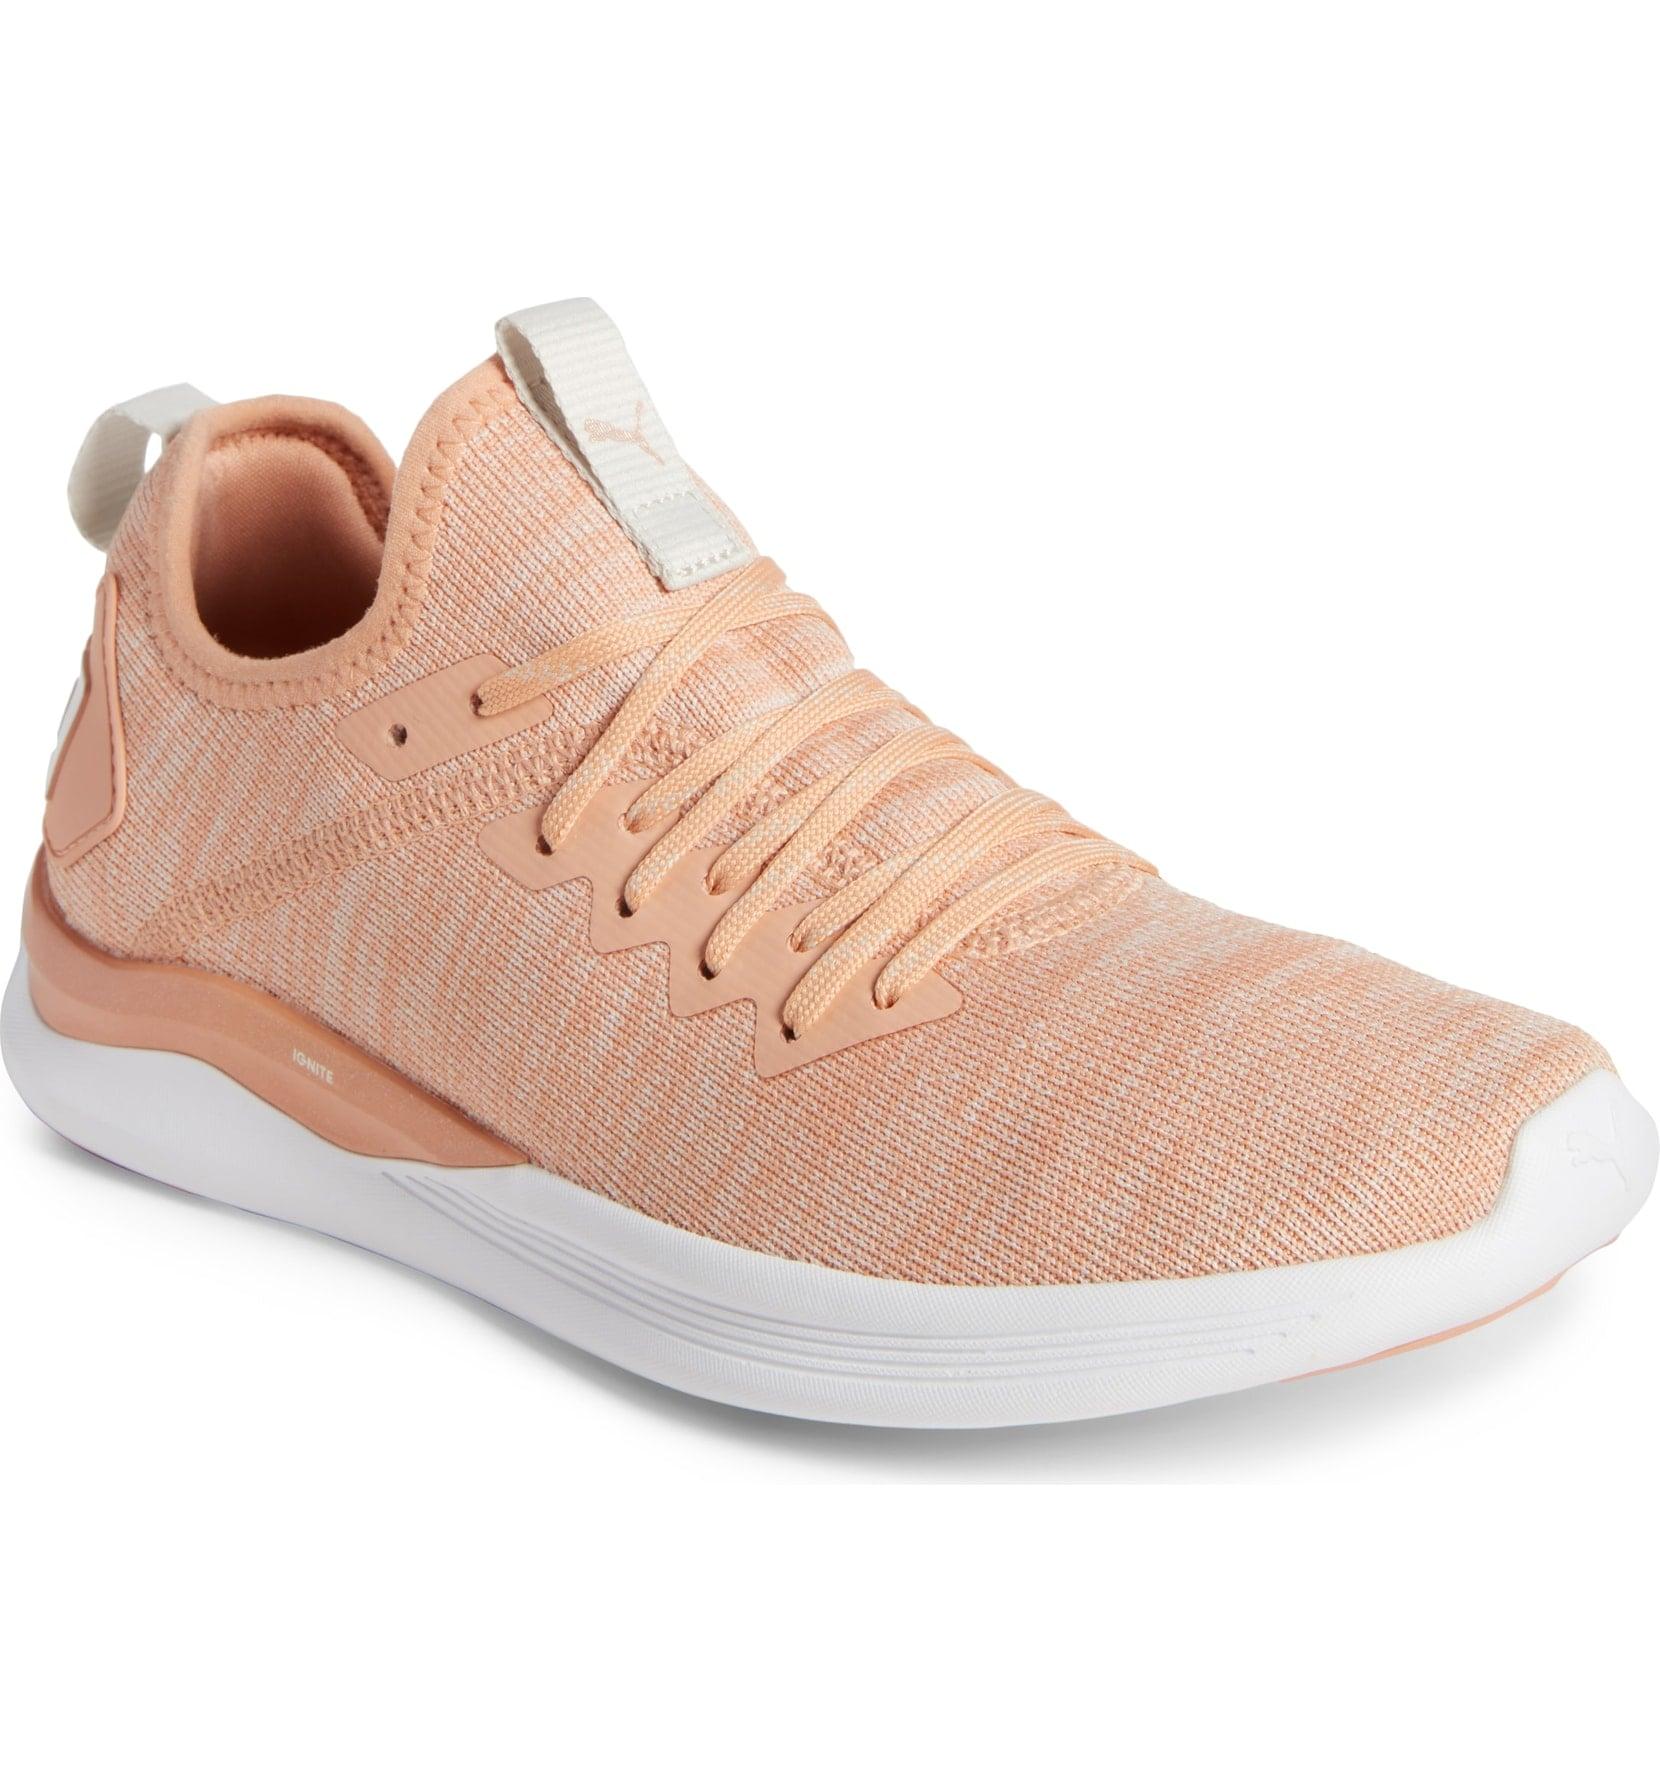 the latest d591f 48c22 Puma Ignite Flash EvoKnit Training Shoes on Sale | POPSUGAR ...